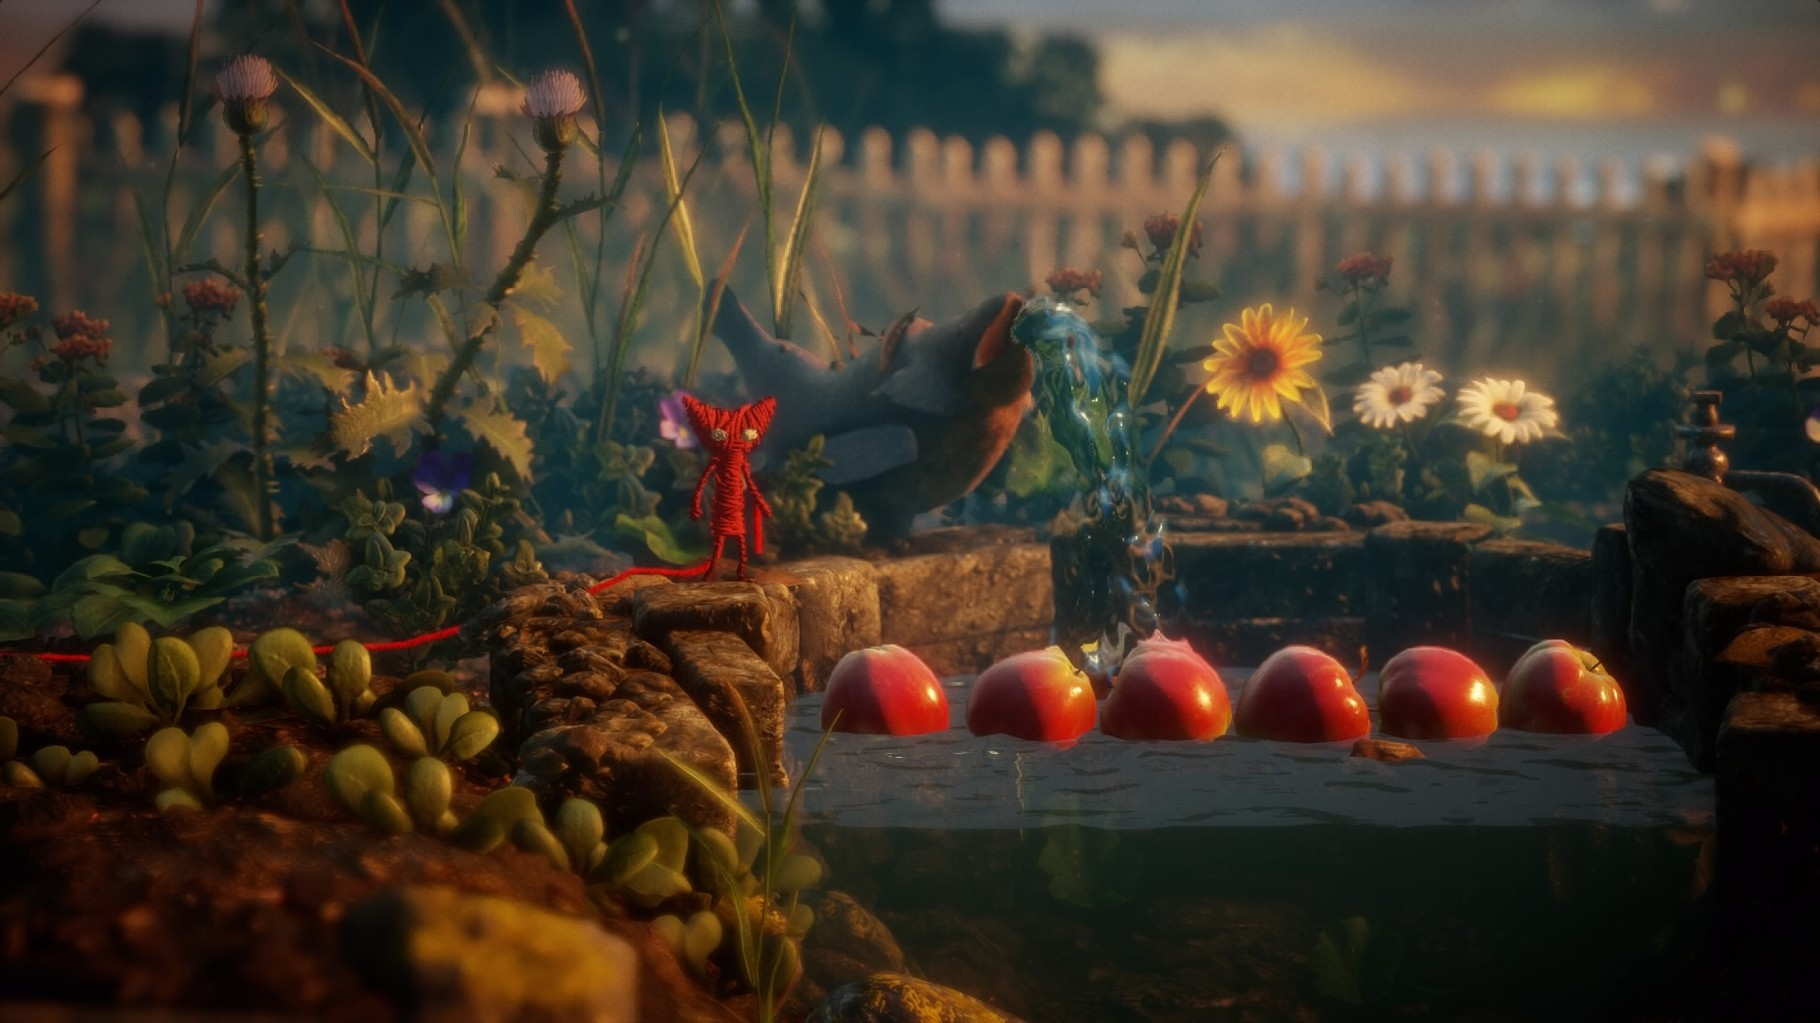 Yarny baut Brücken aus Äpfeln...